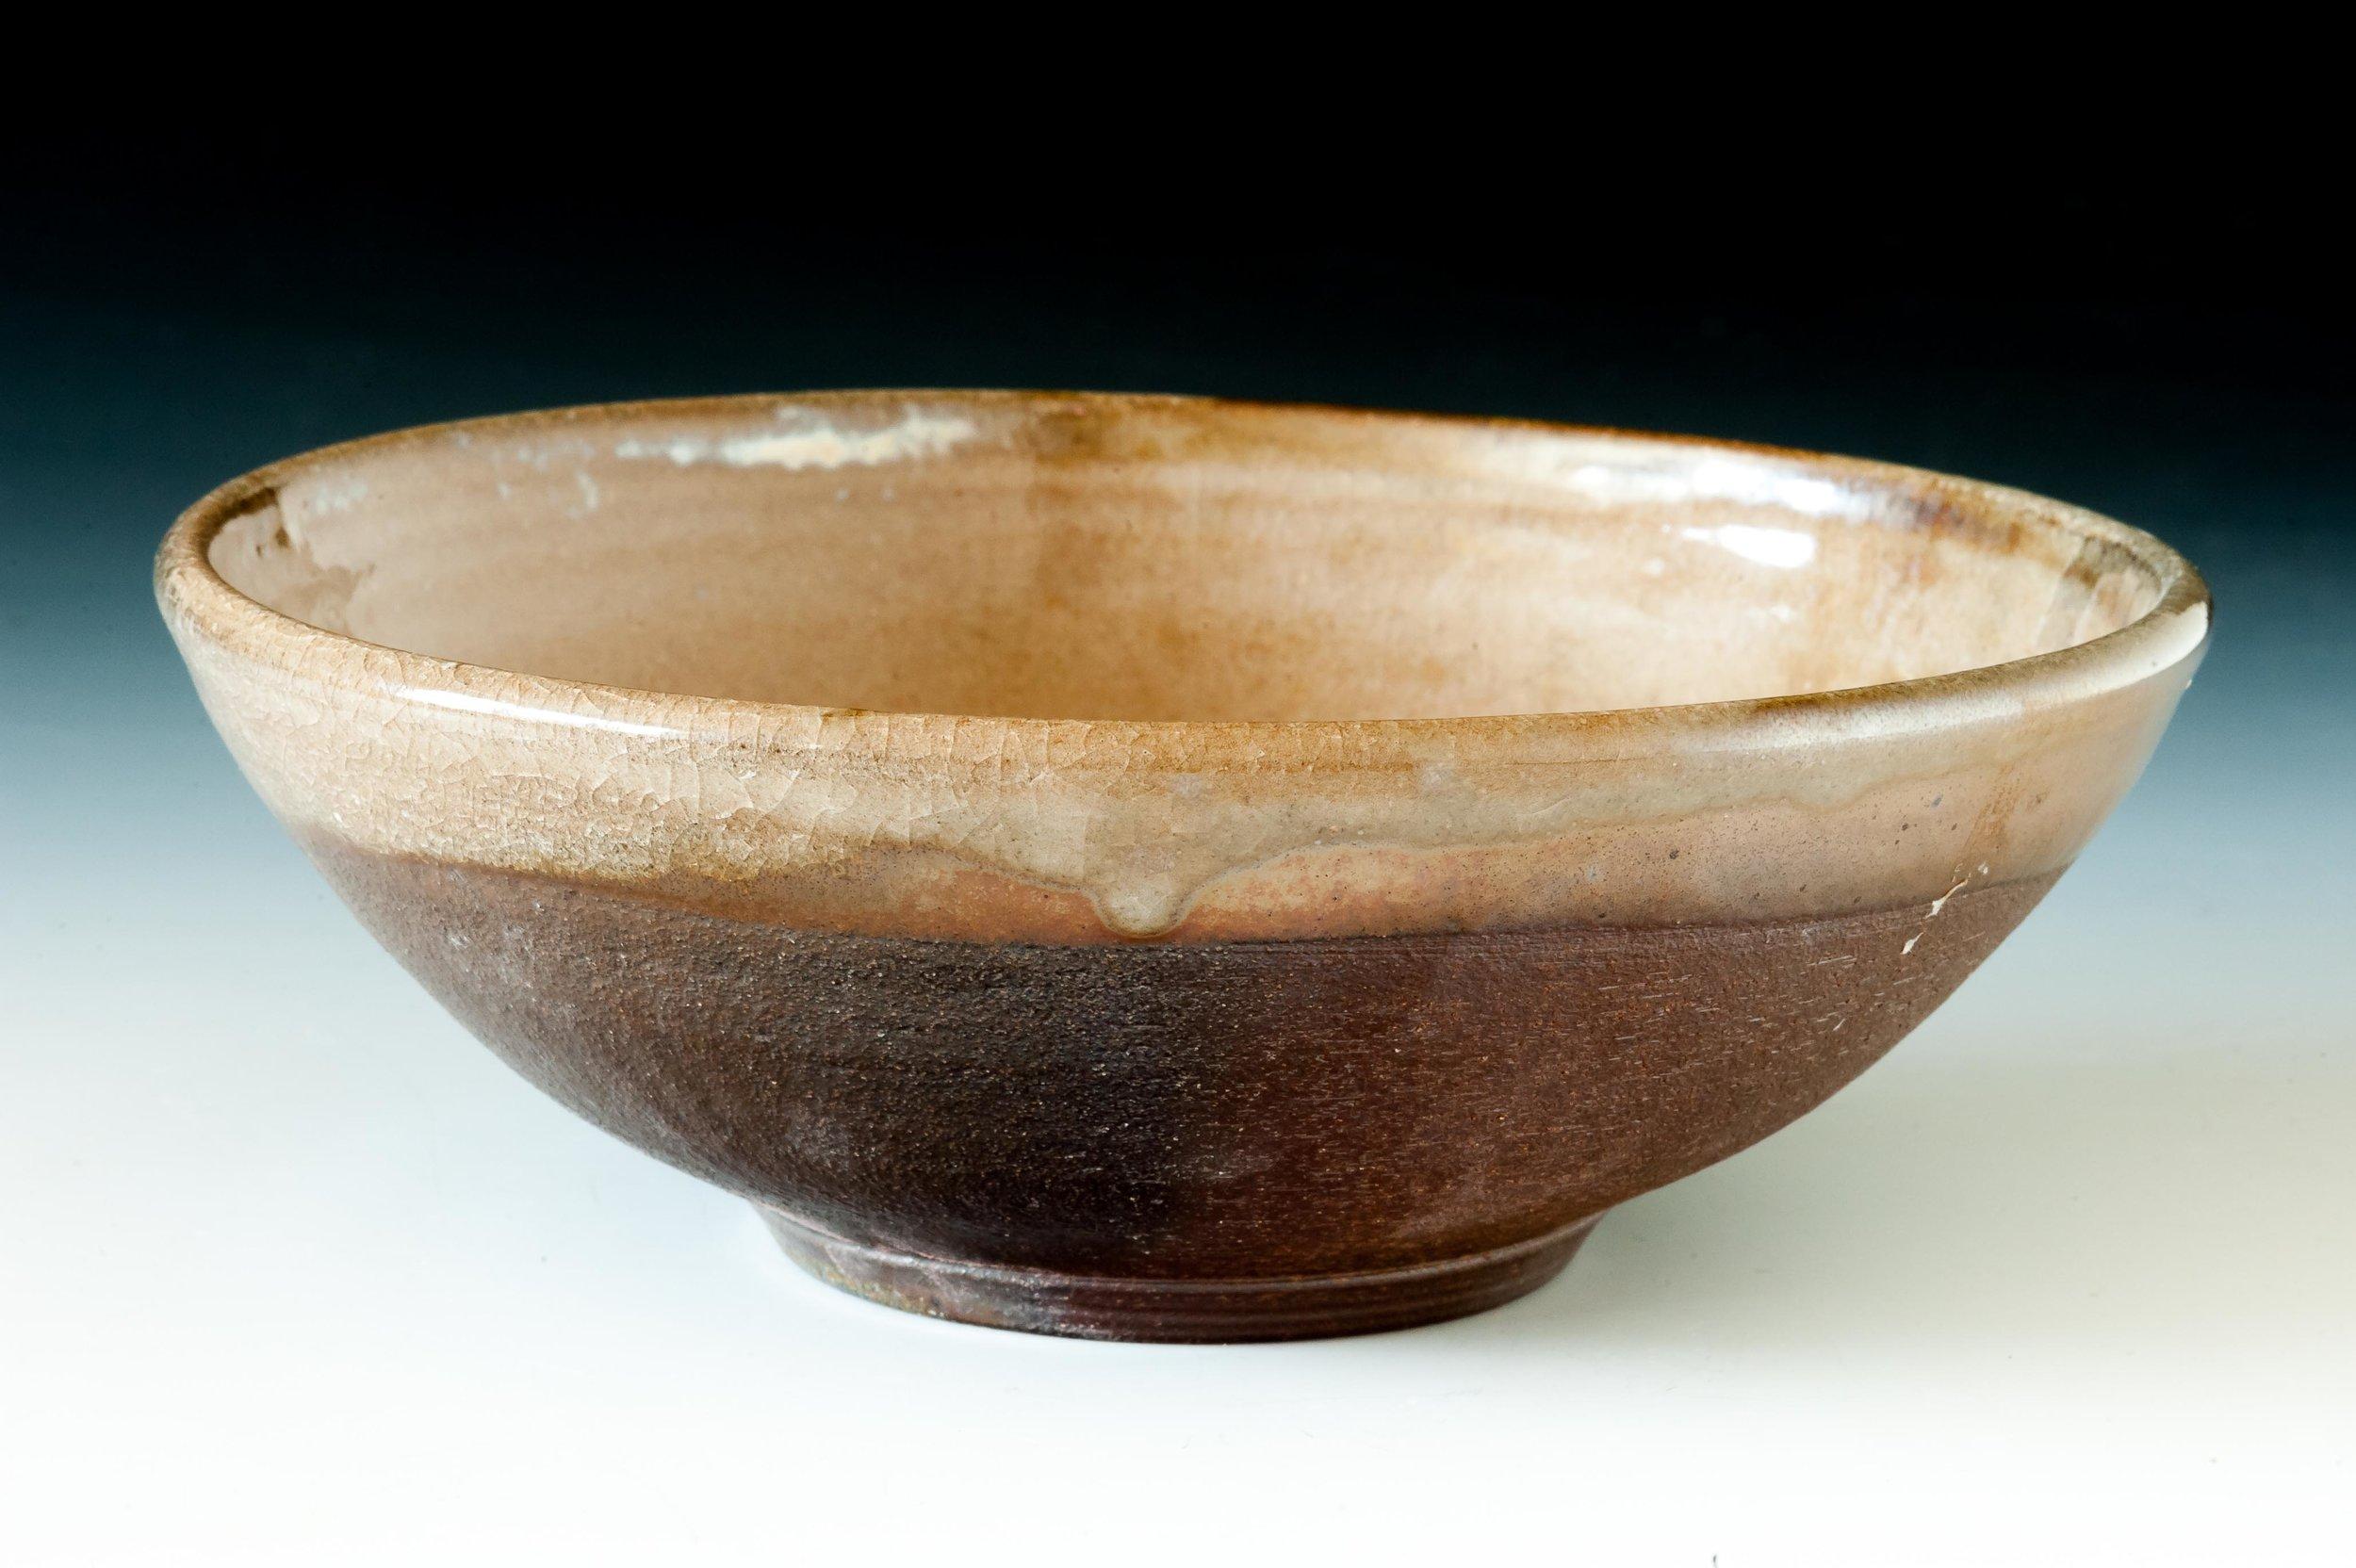 bowls on gradient-3321.jpg